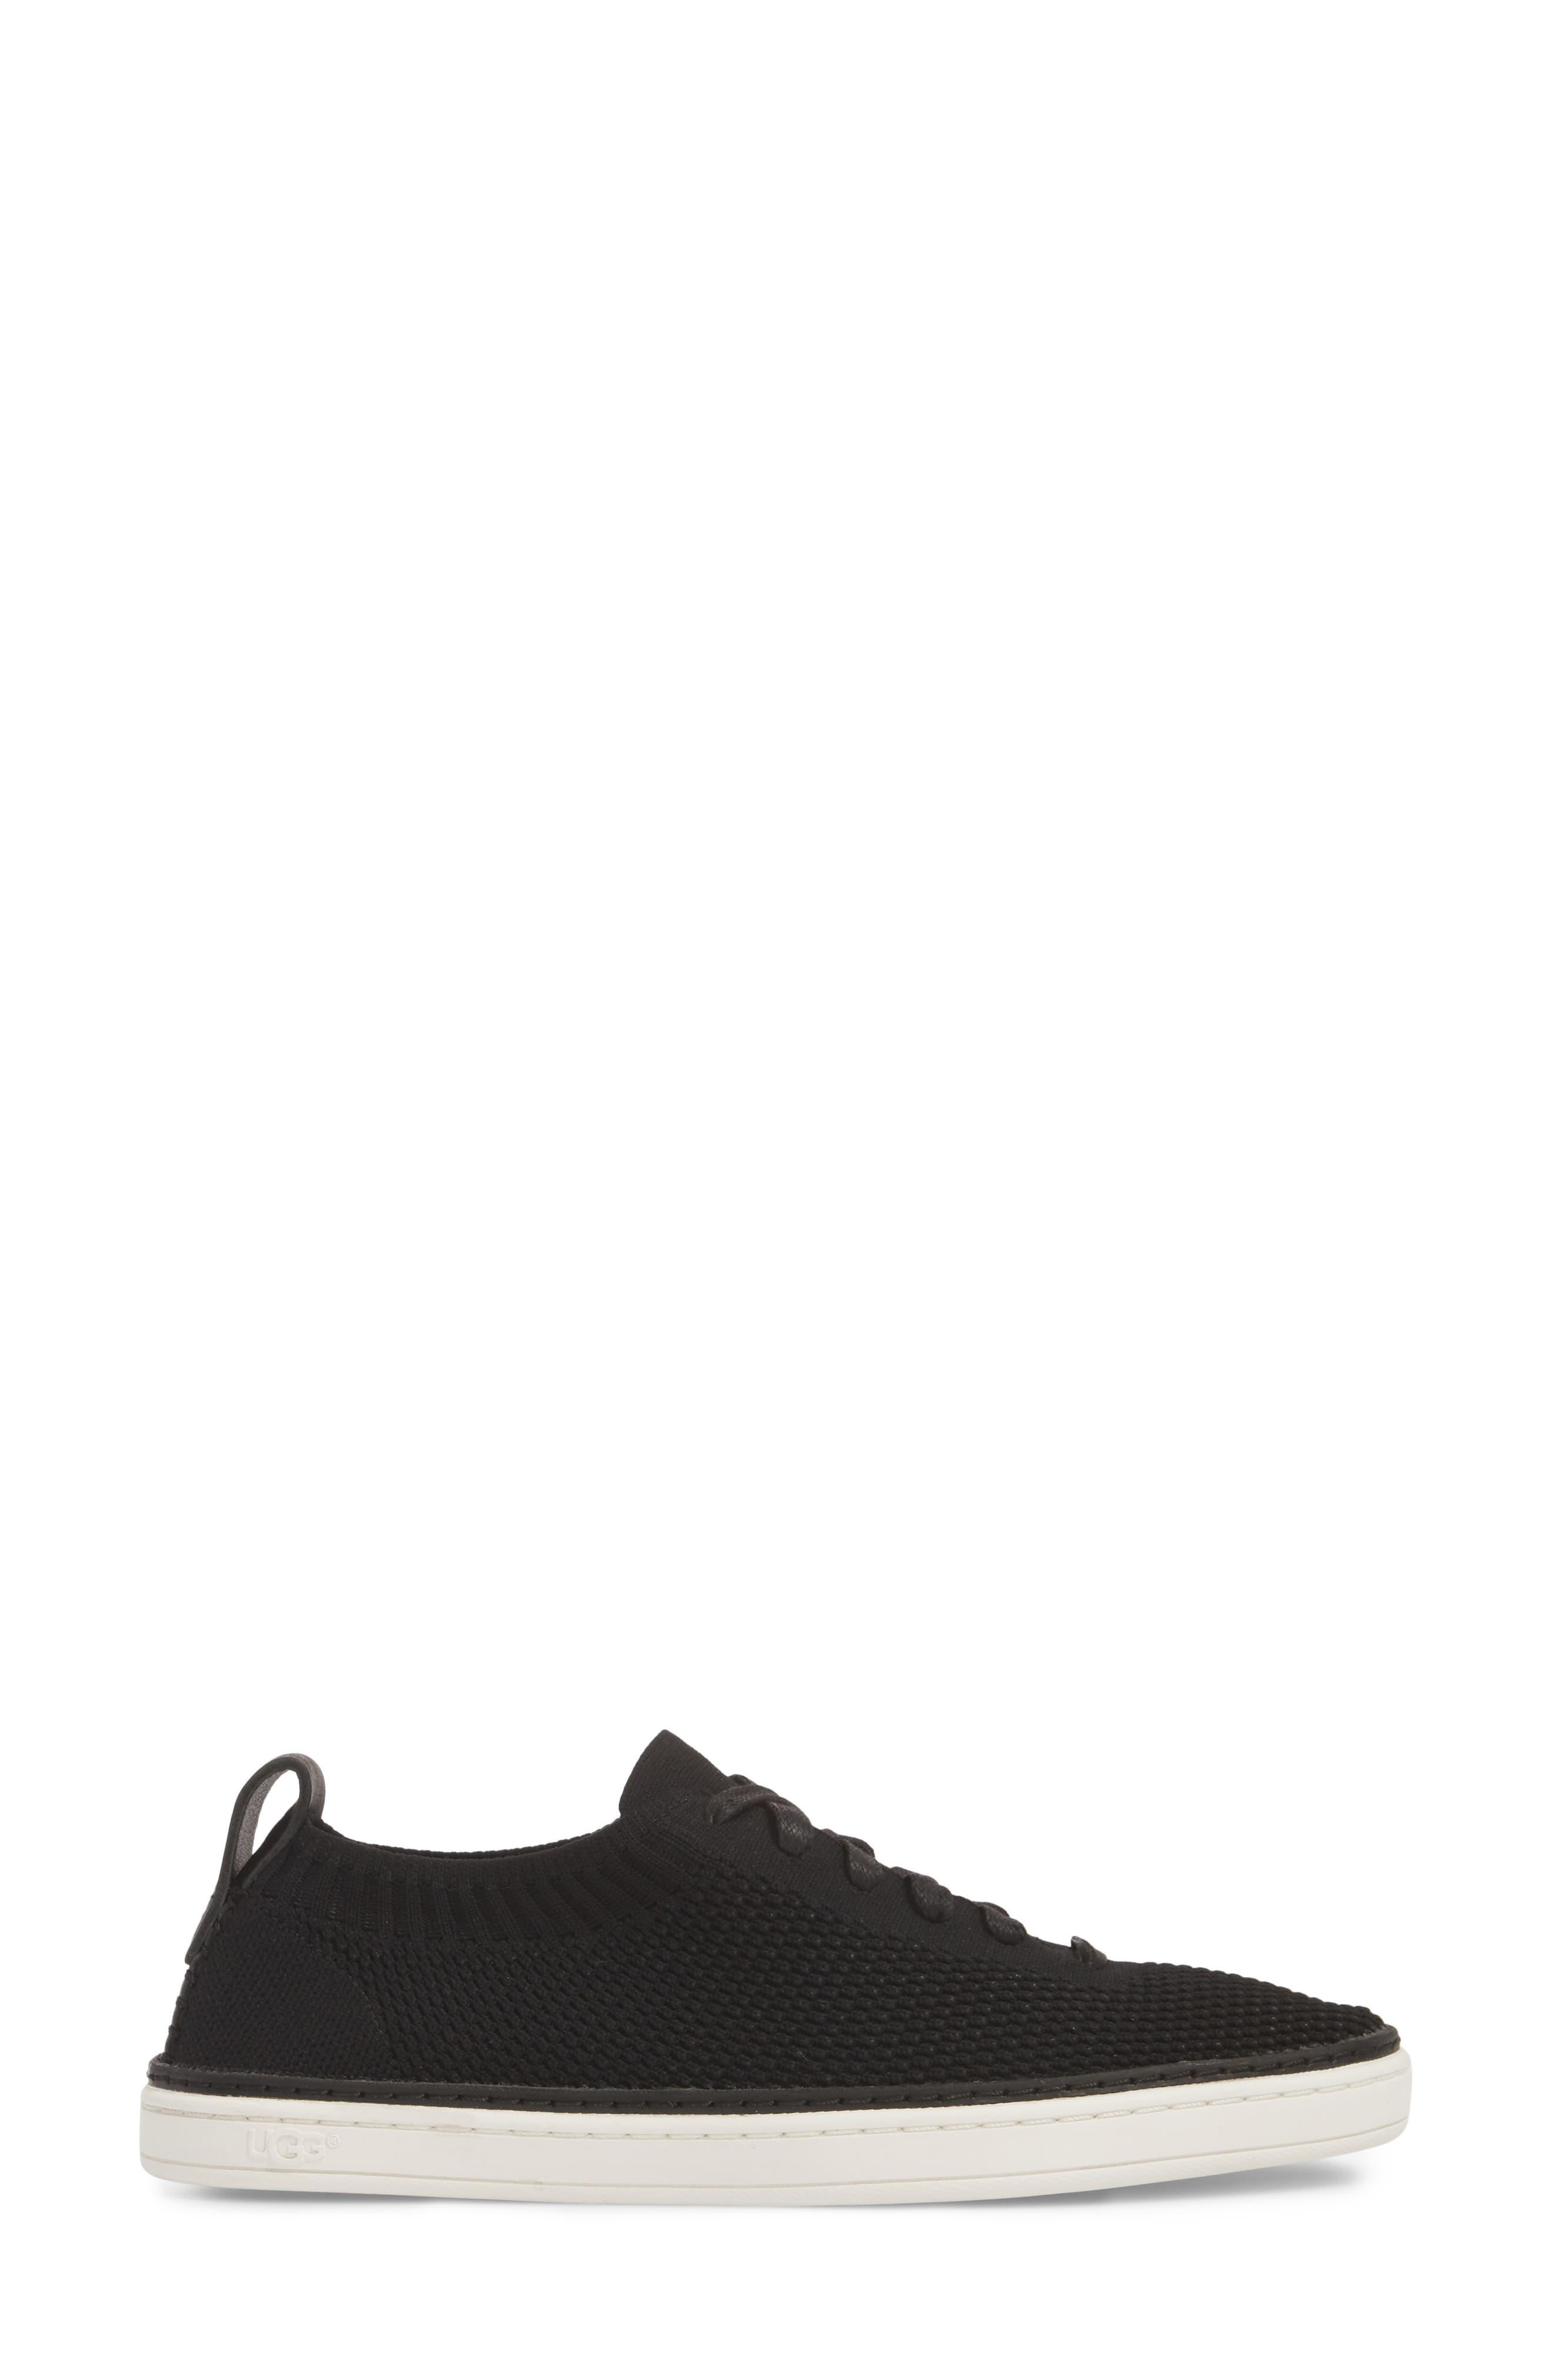 Sidney Sneaker,                             Alternate thumbnail 3, color,                             BLACK FABRIC